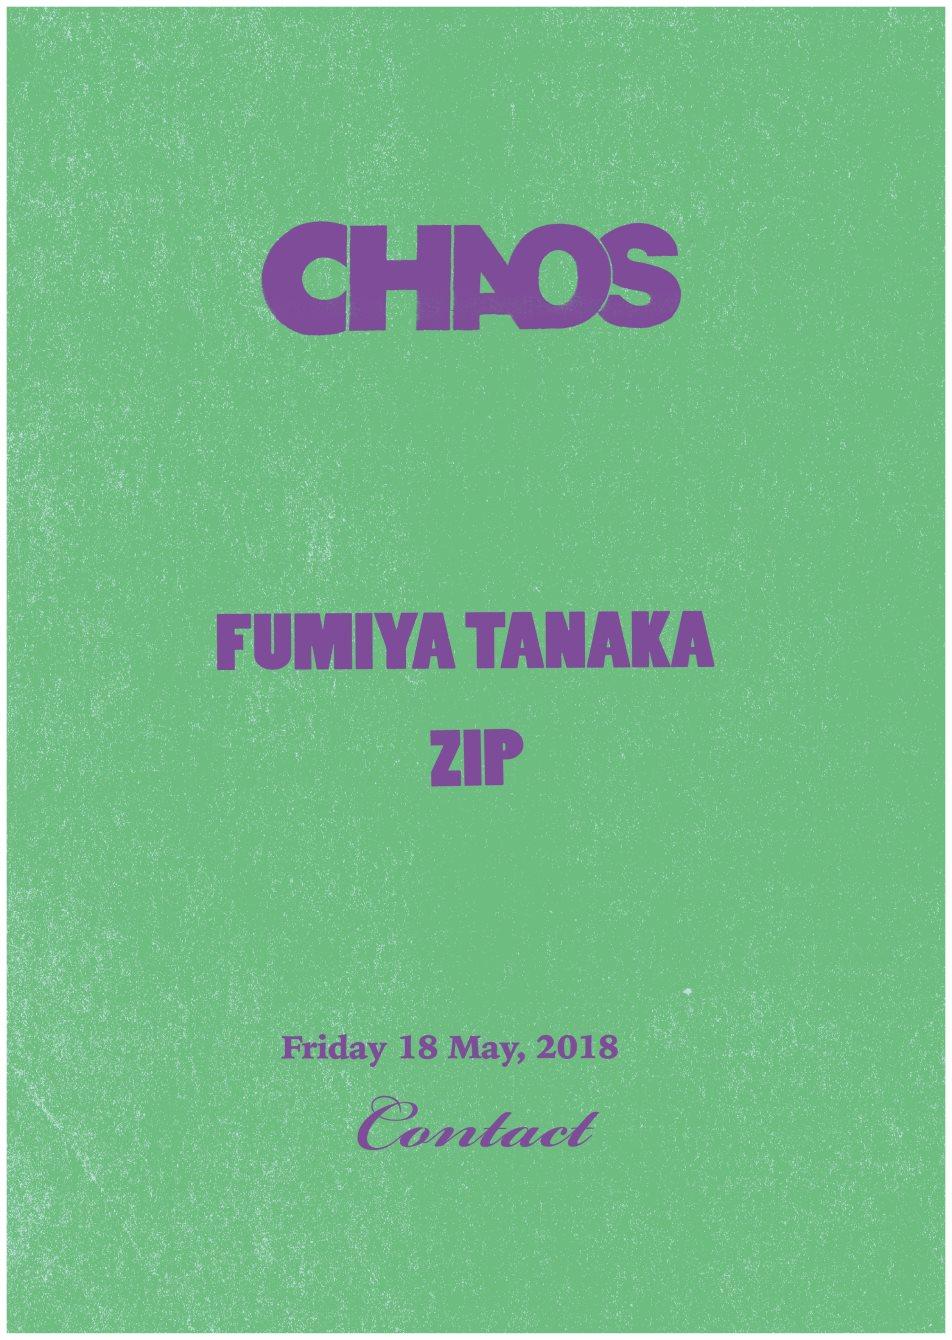 Chaos -ZIP- - Flyer back